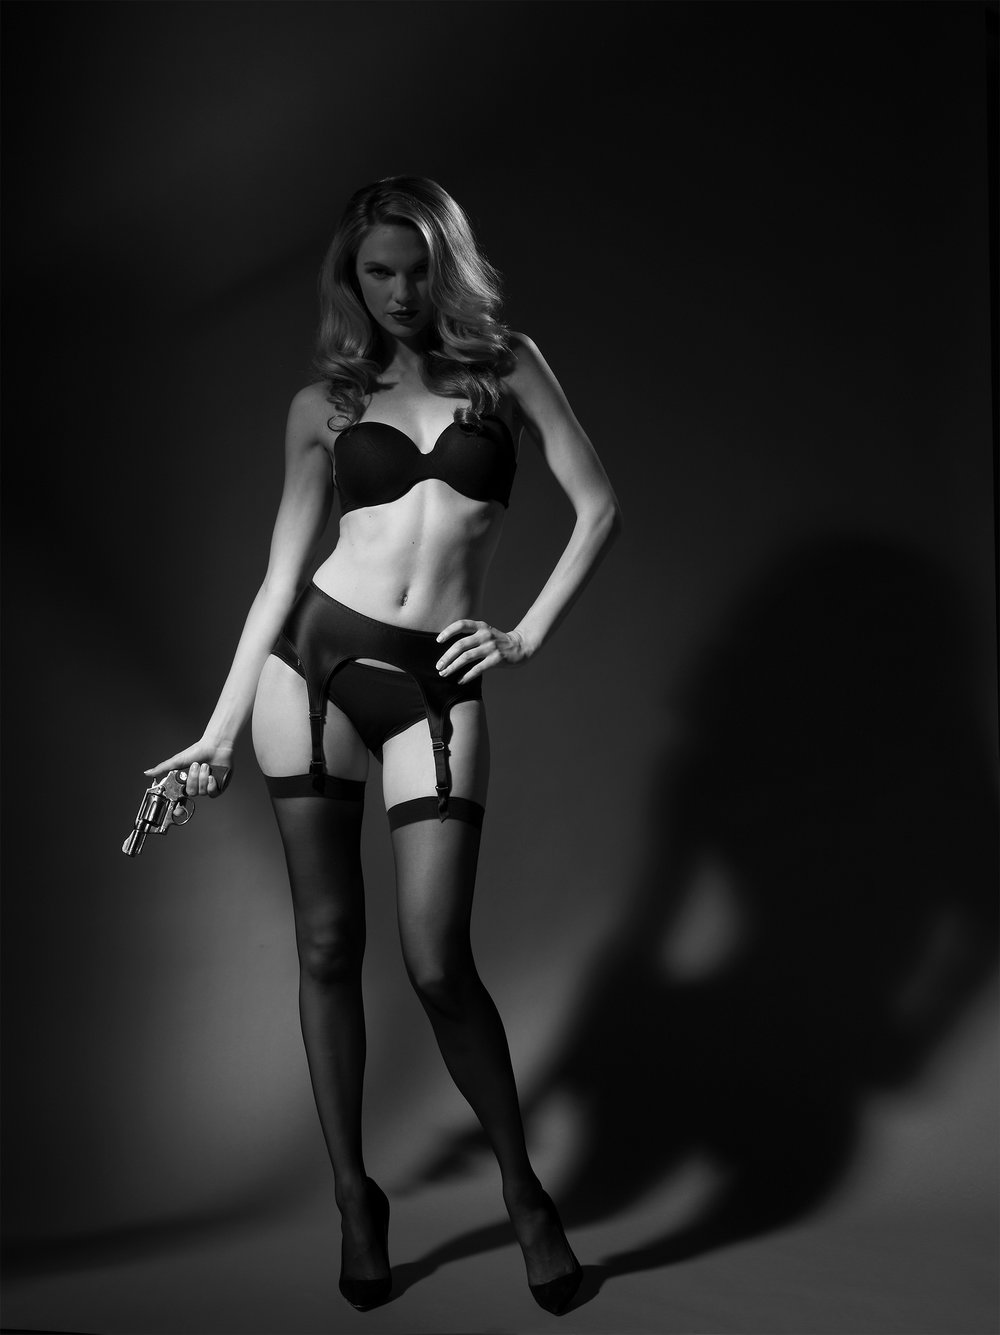 noir_woman.jpg